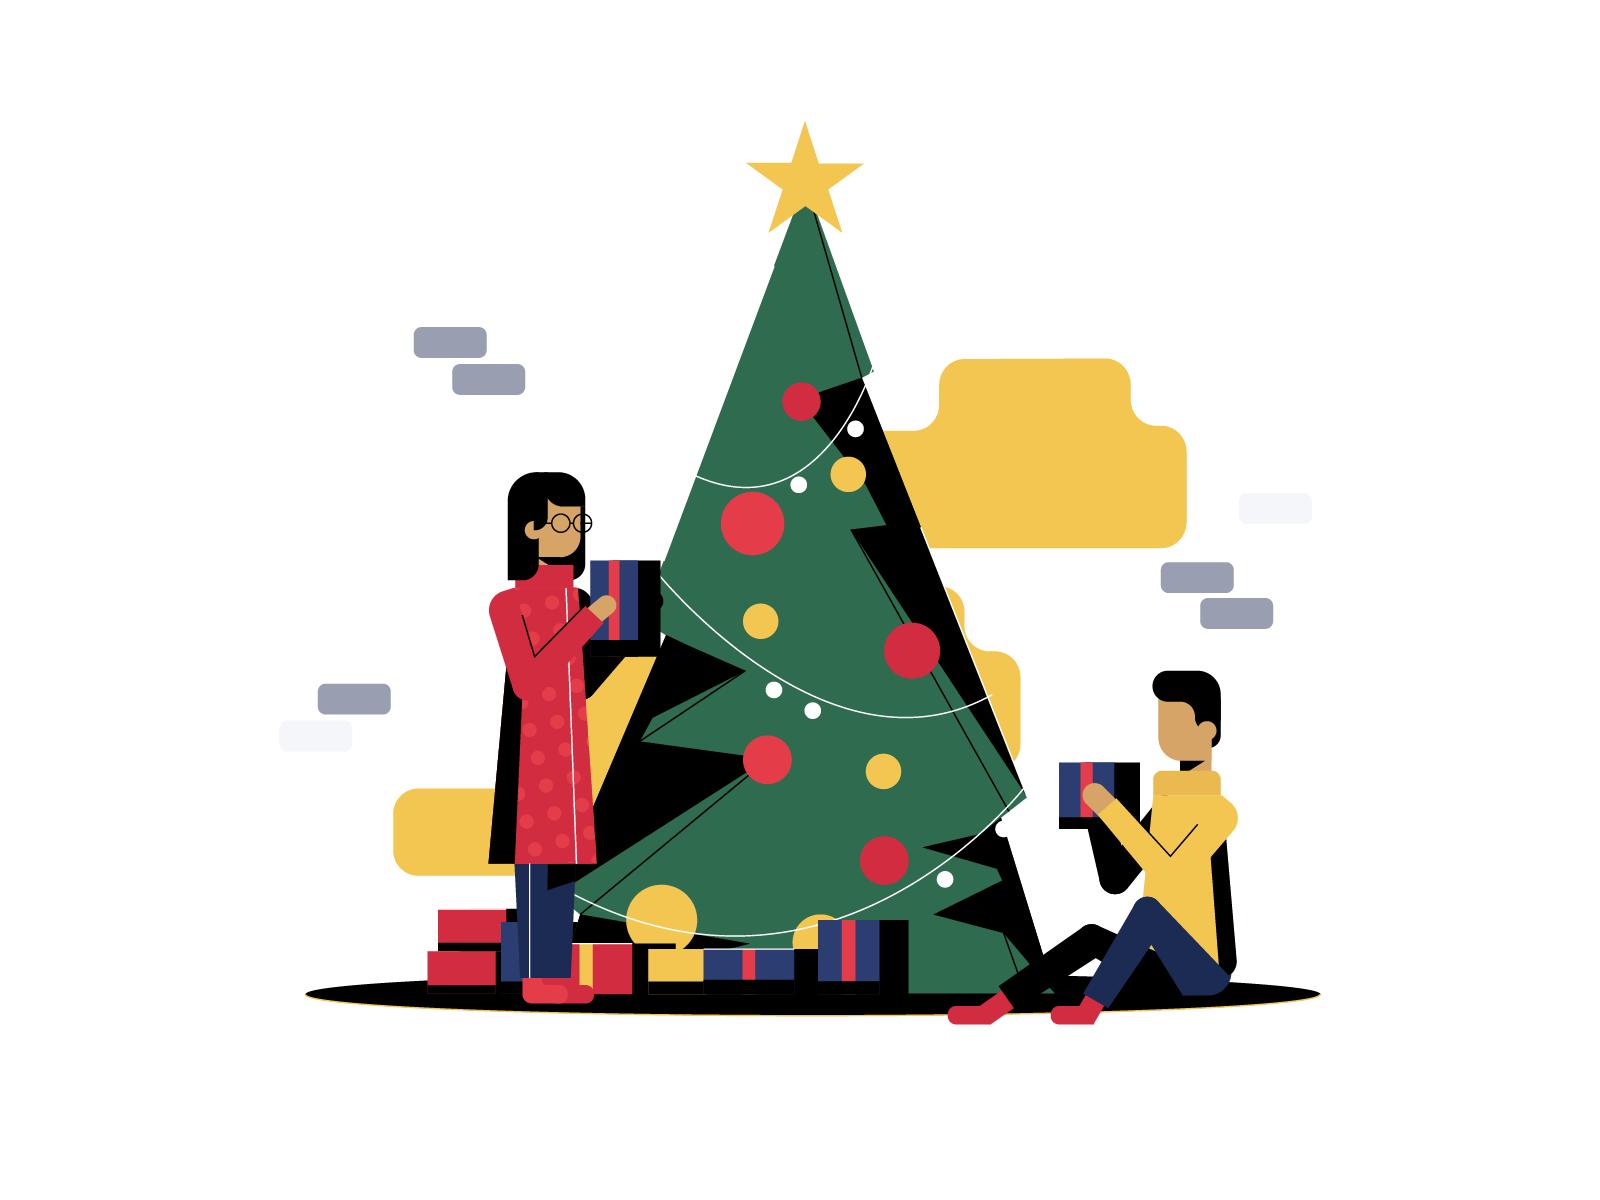 Christmas Illustrations Png.Dribbble Christmas Dribbble White 2 01 Png By Gytis Jonaitis